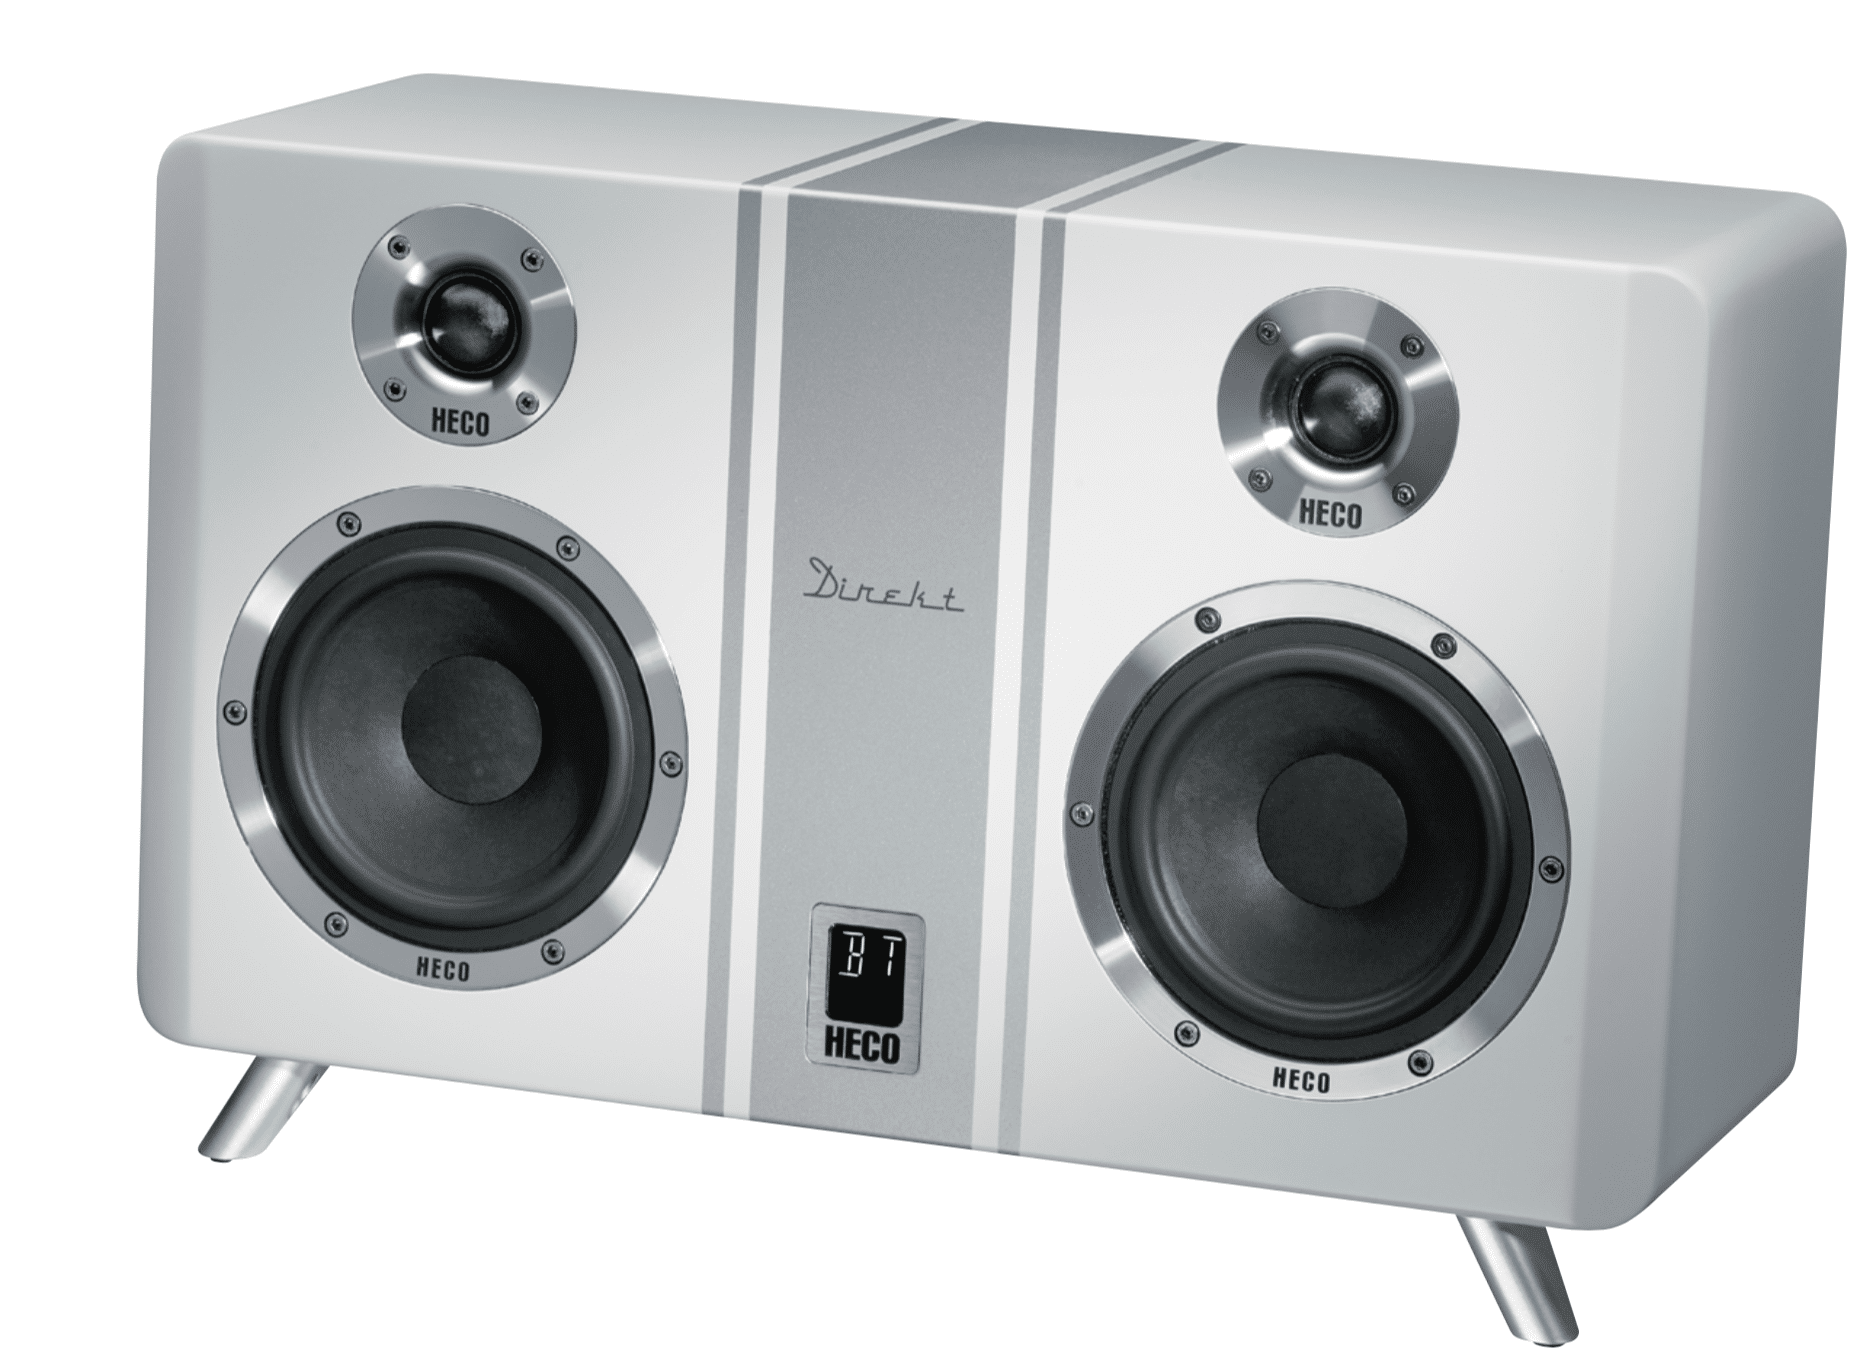 Direkt 800 BT Speaker From Heco